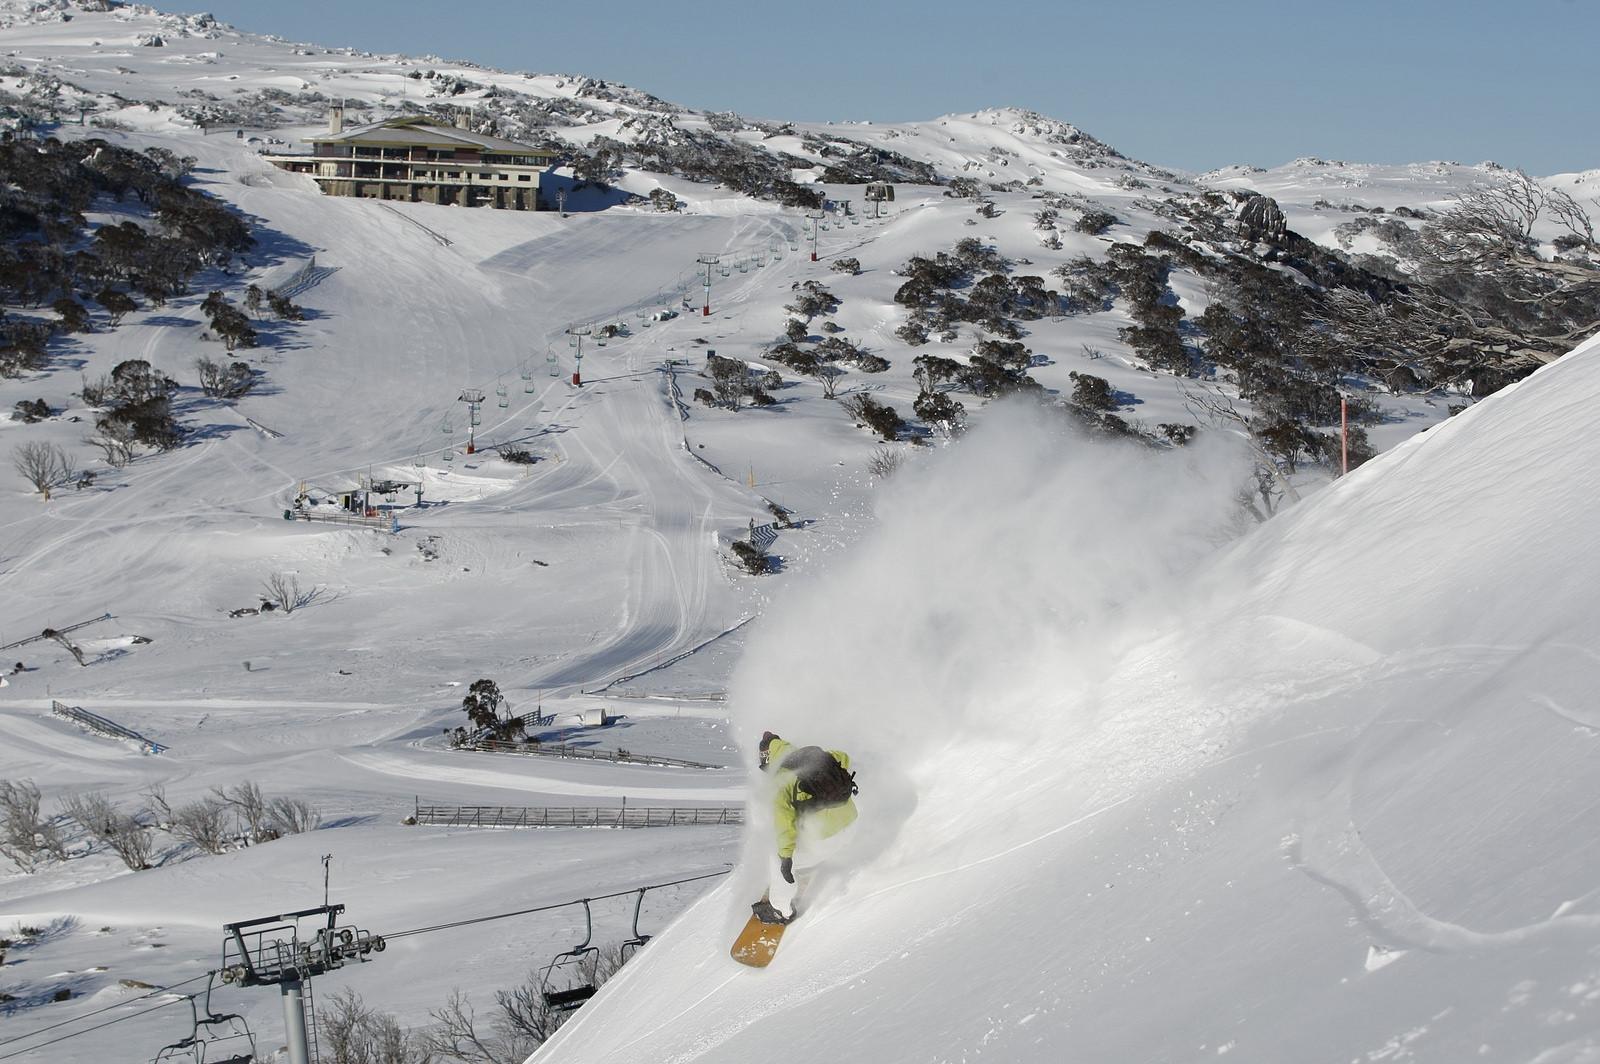 Letné lyžiarske stredisko Perisher, Austrália